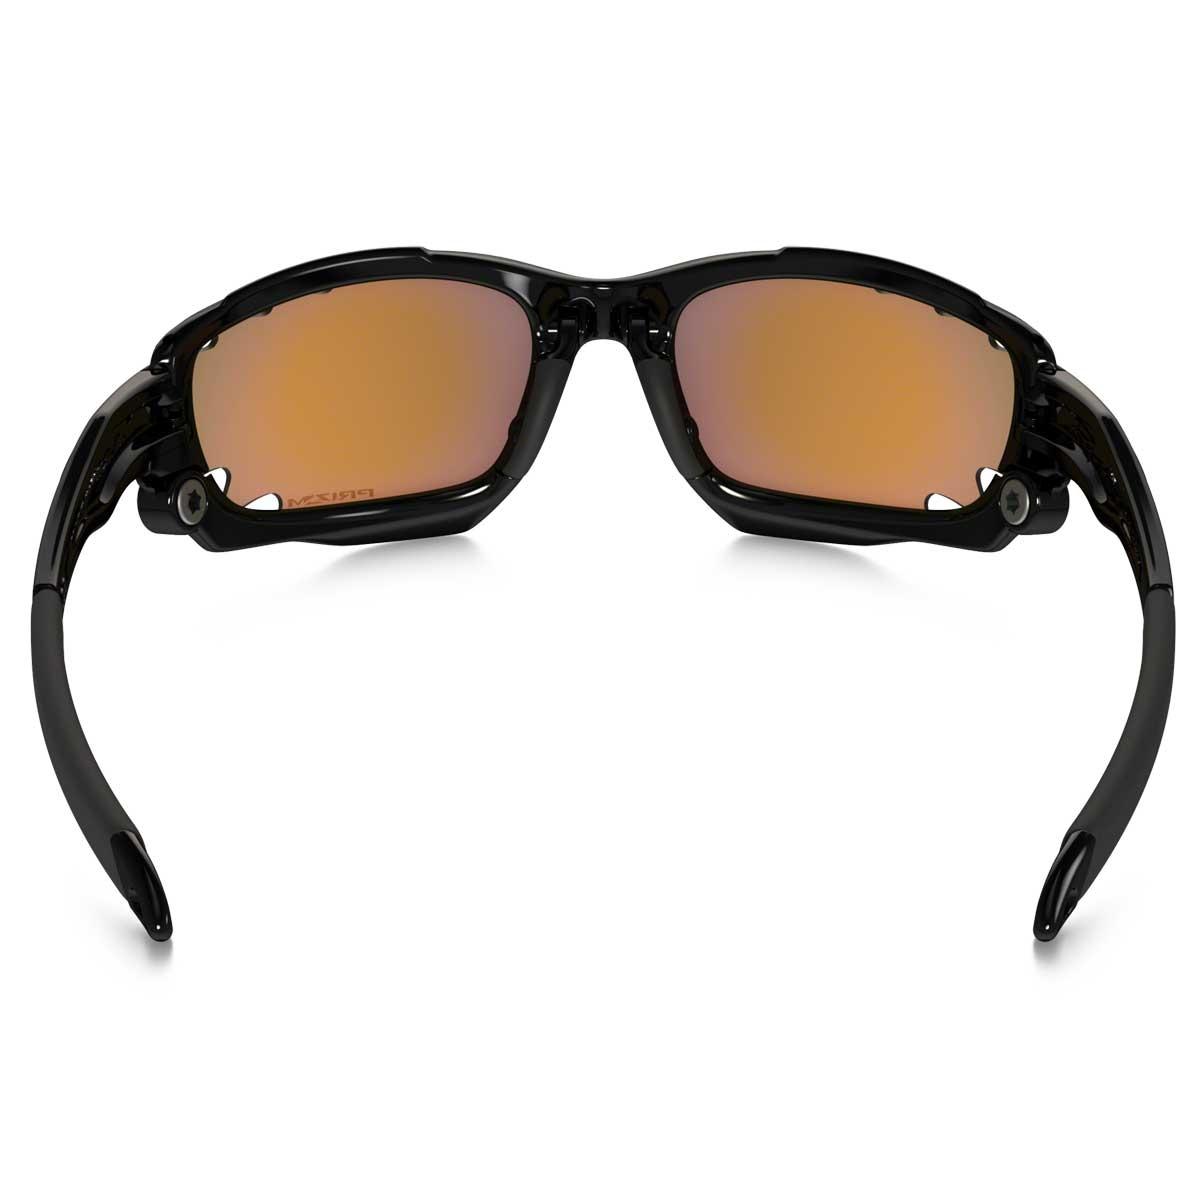 ... Image of Oakley Racing Jacket Vented Sunglasses - Polished Black   Prizm  Trail ... 39e9e47a75